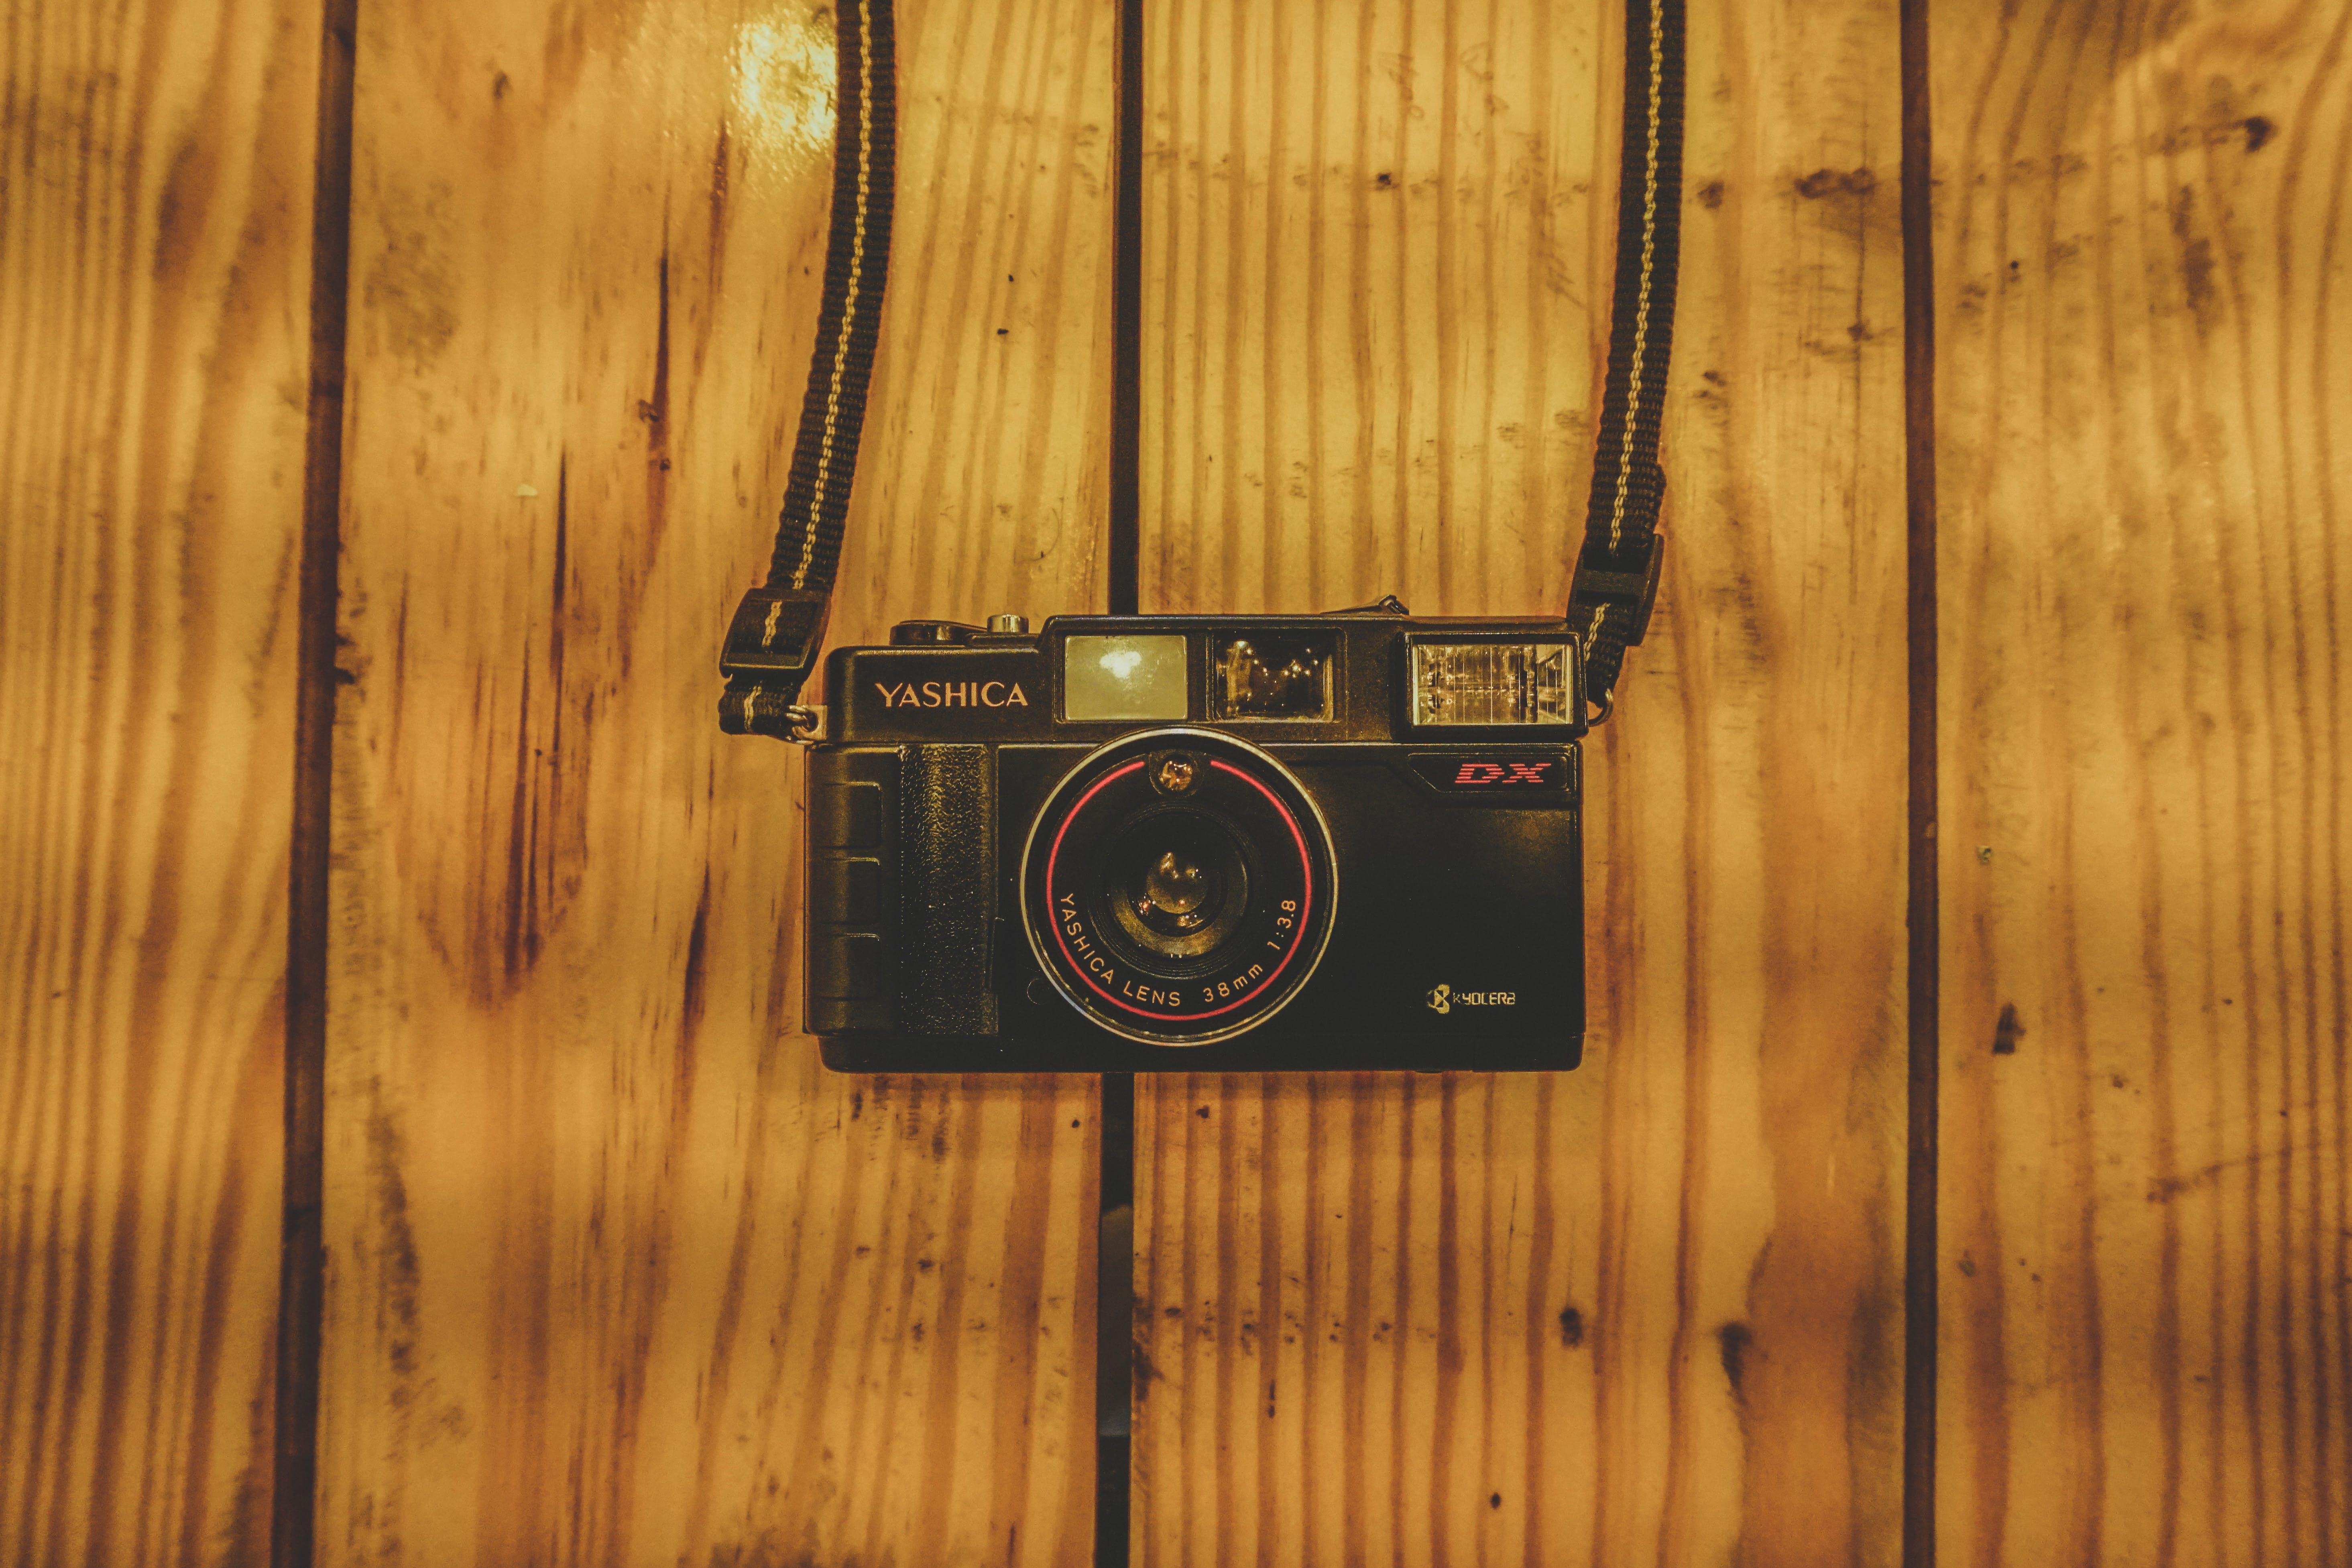 Black and Gray Yashica Digital Camera